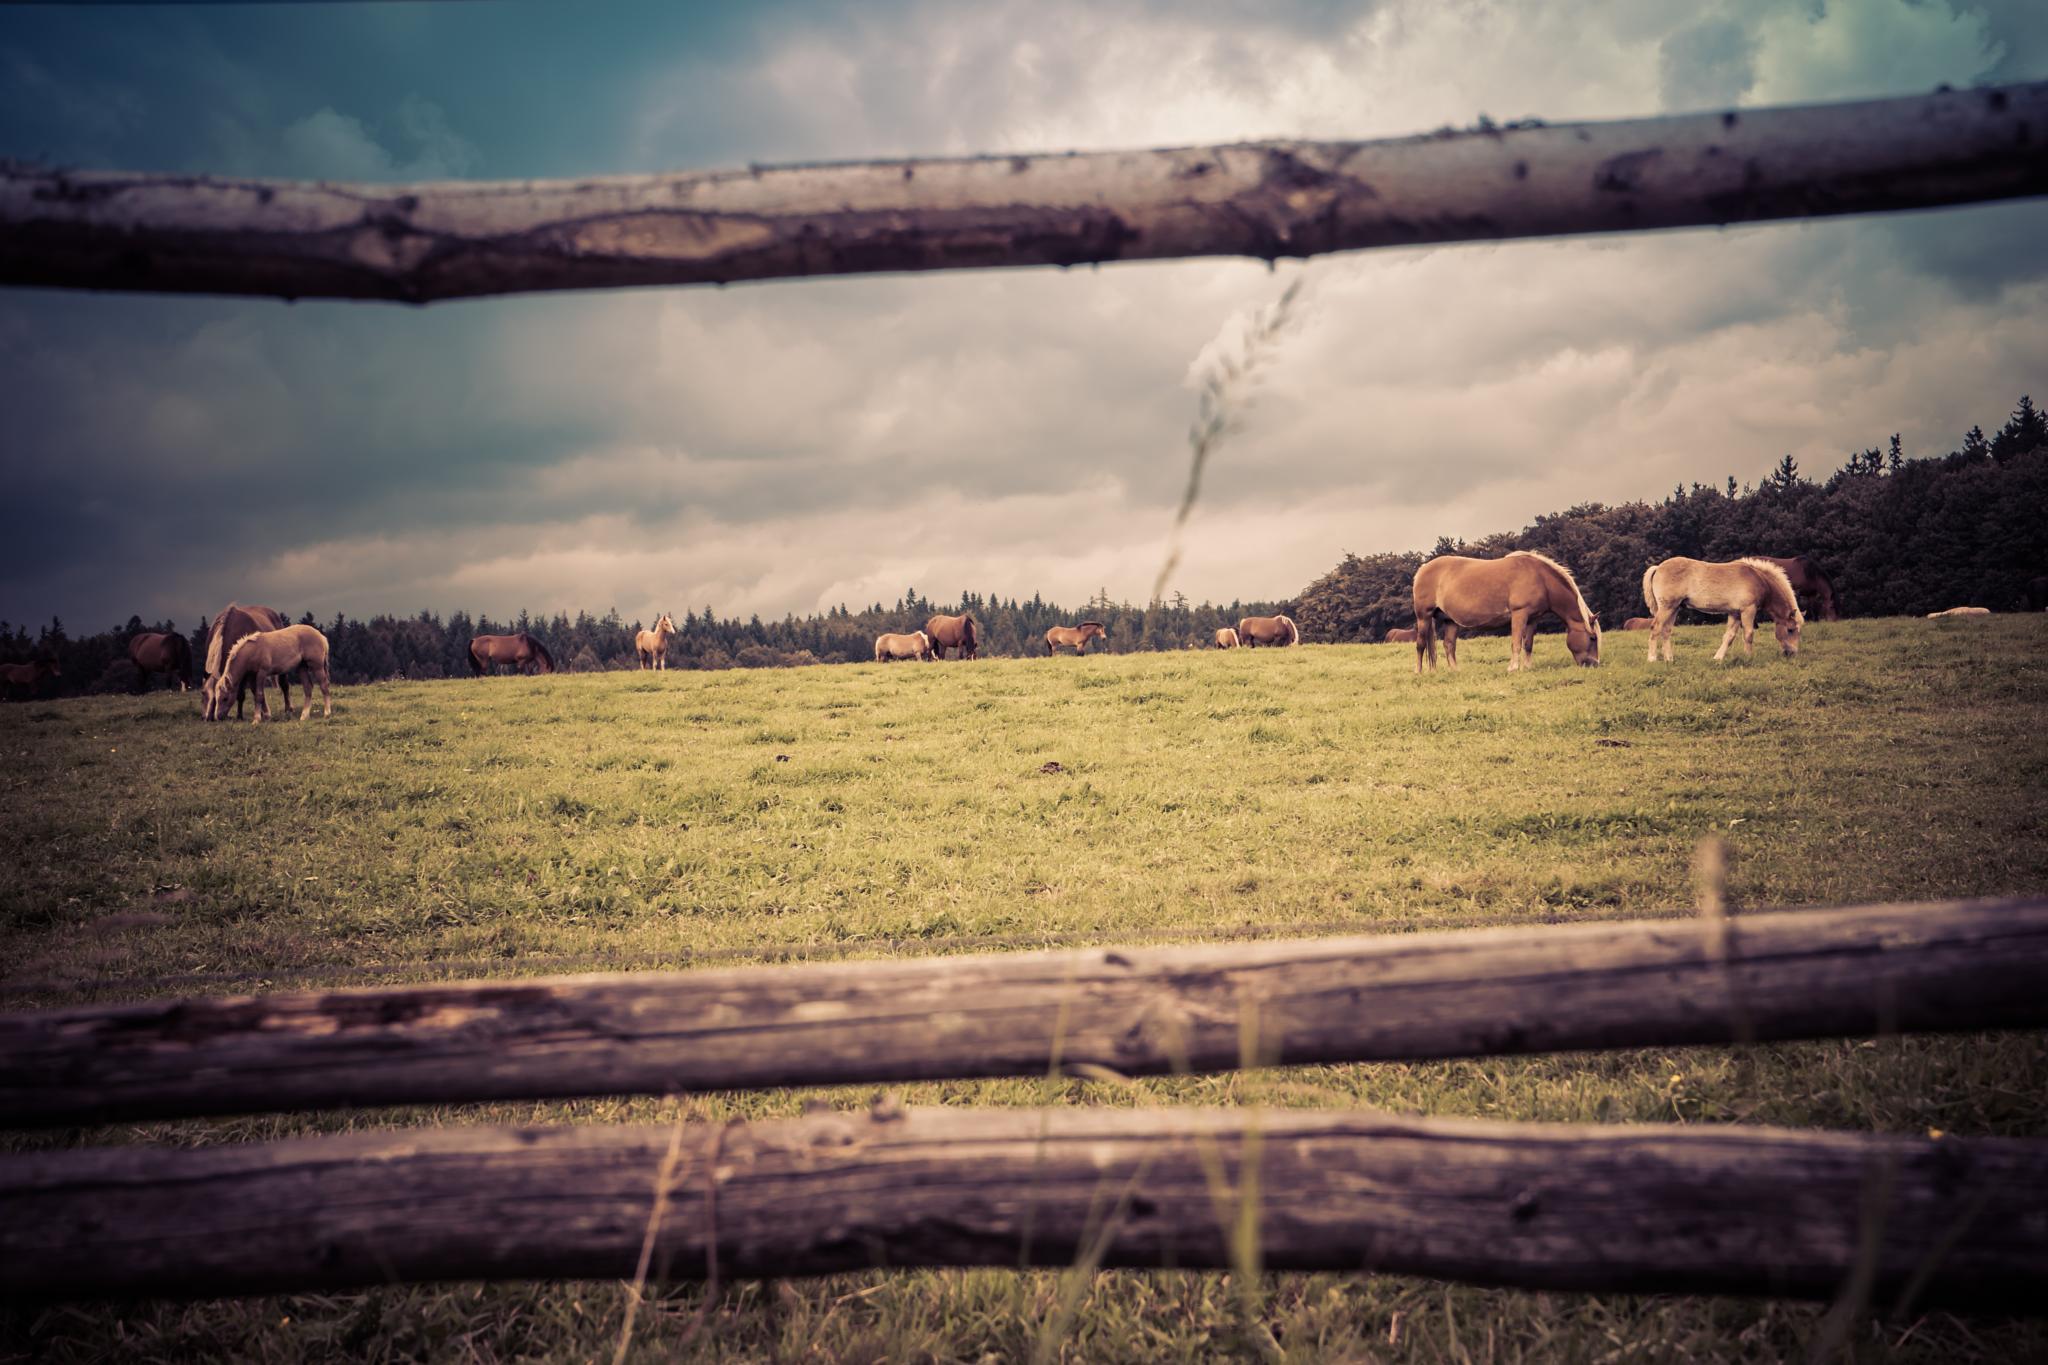 Pferdekoppel by Oliver Penack